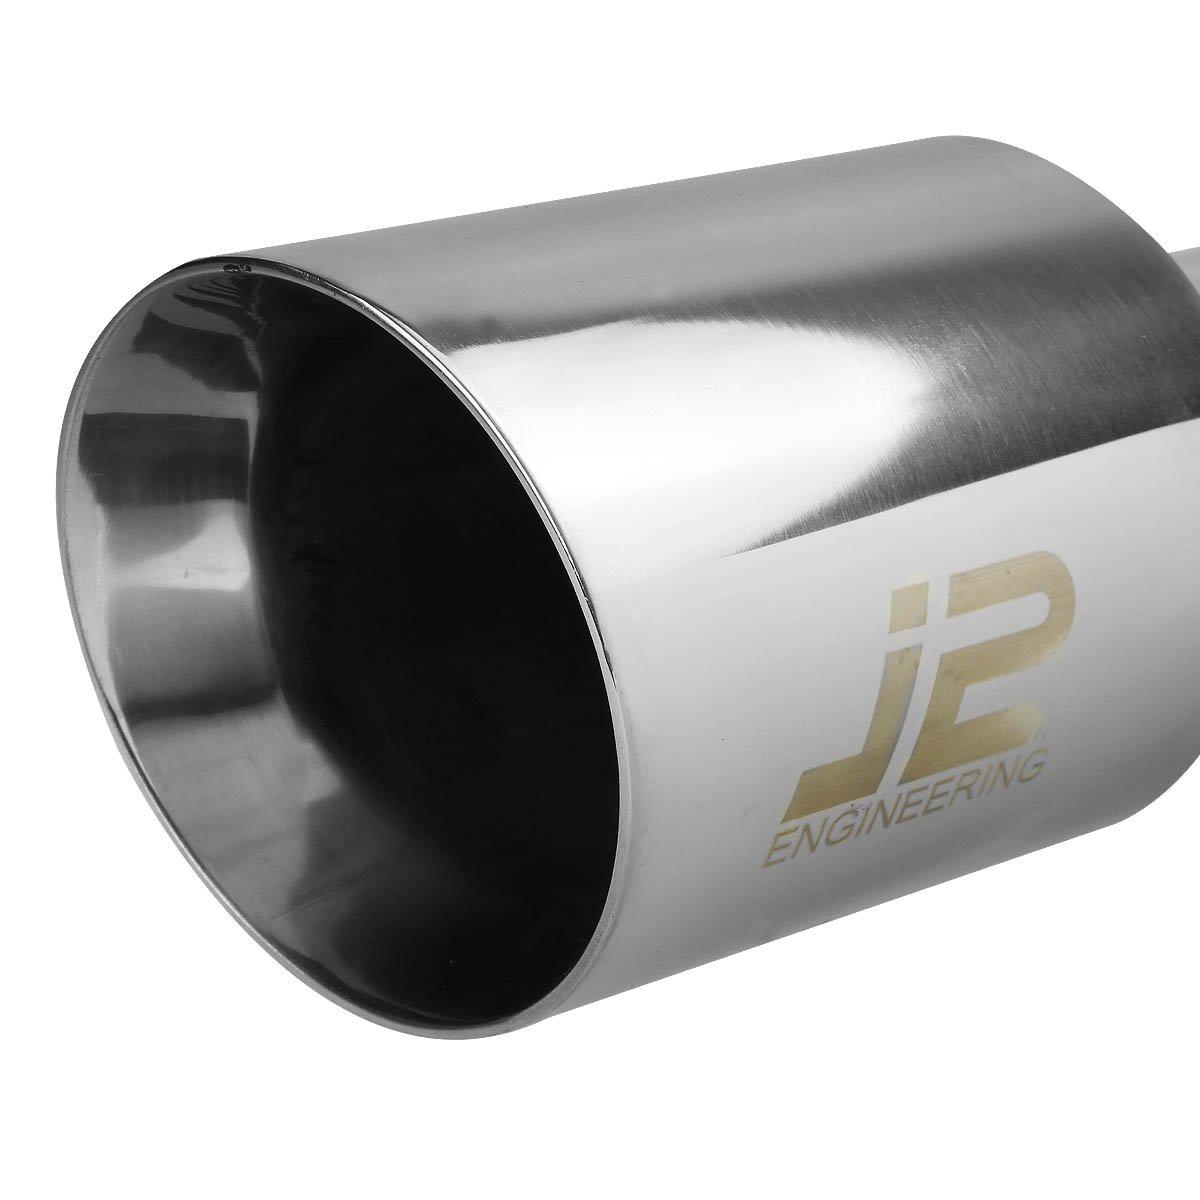 DNA Motoring J2 Engineering J2-CBE-003 Catback Exhaust System